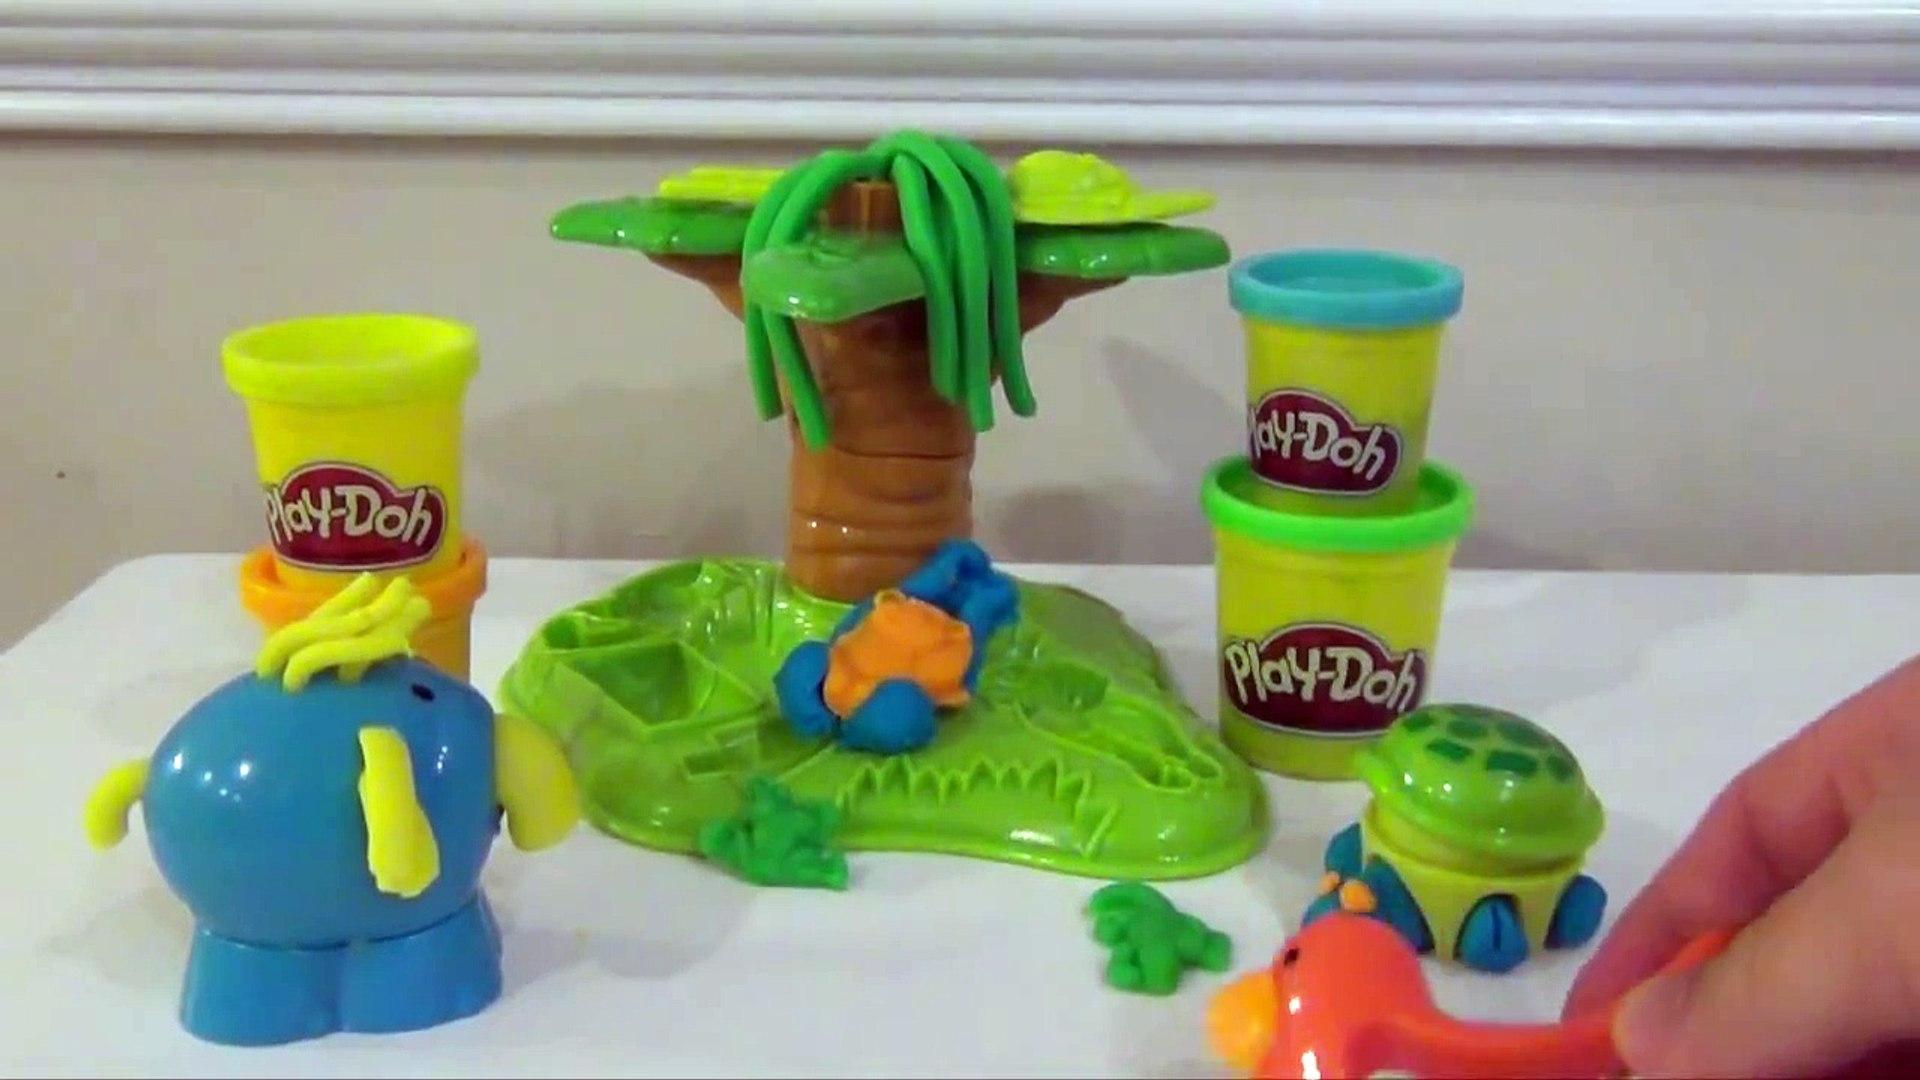 PLAY-DOH Tutorial Animal Activities Jungle Pets How to Make Play-Doh Jungle Pets Play Set Toy